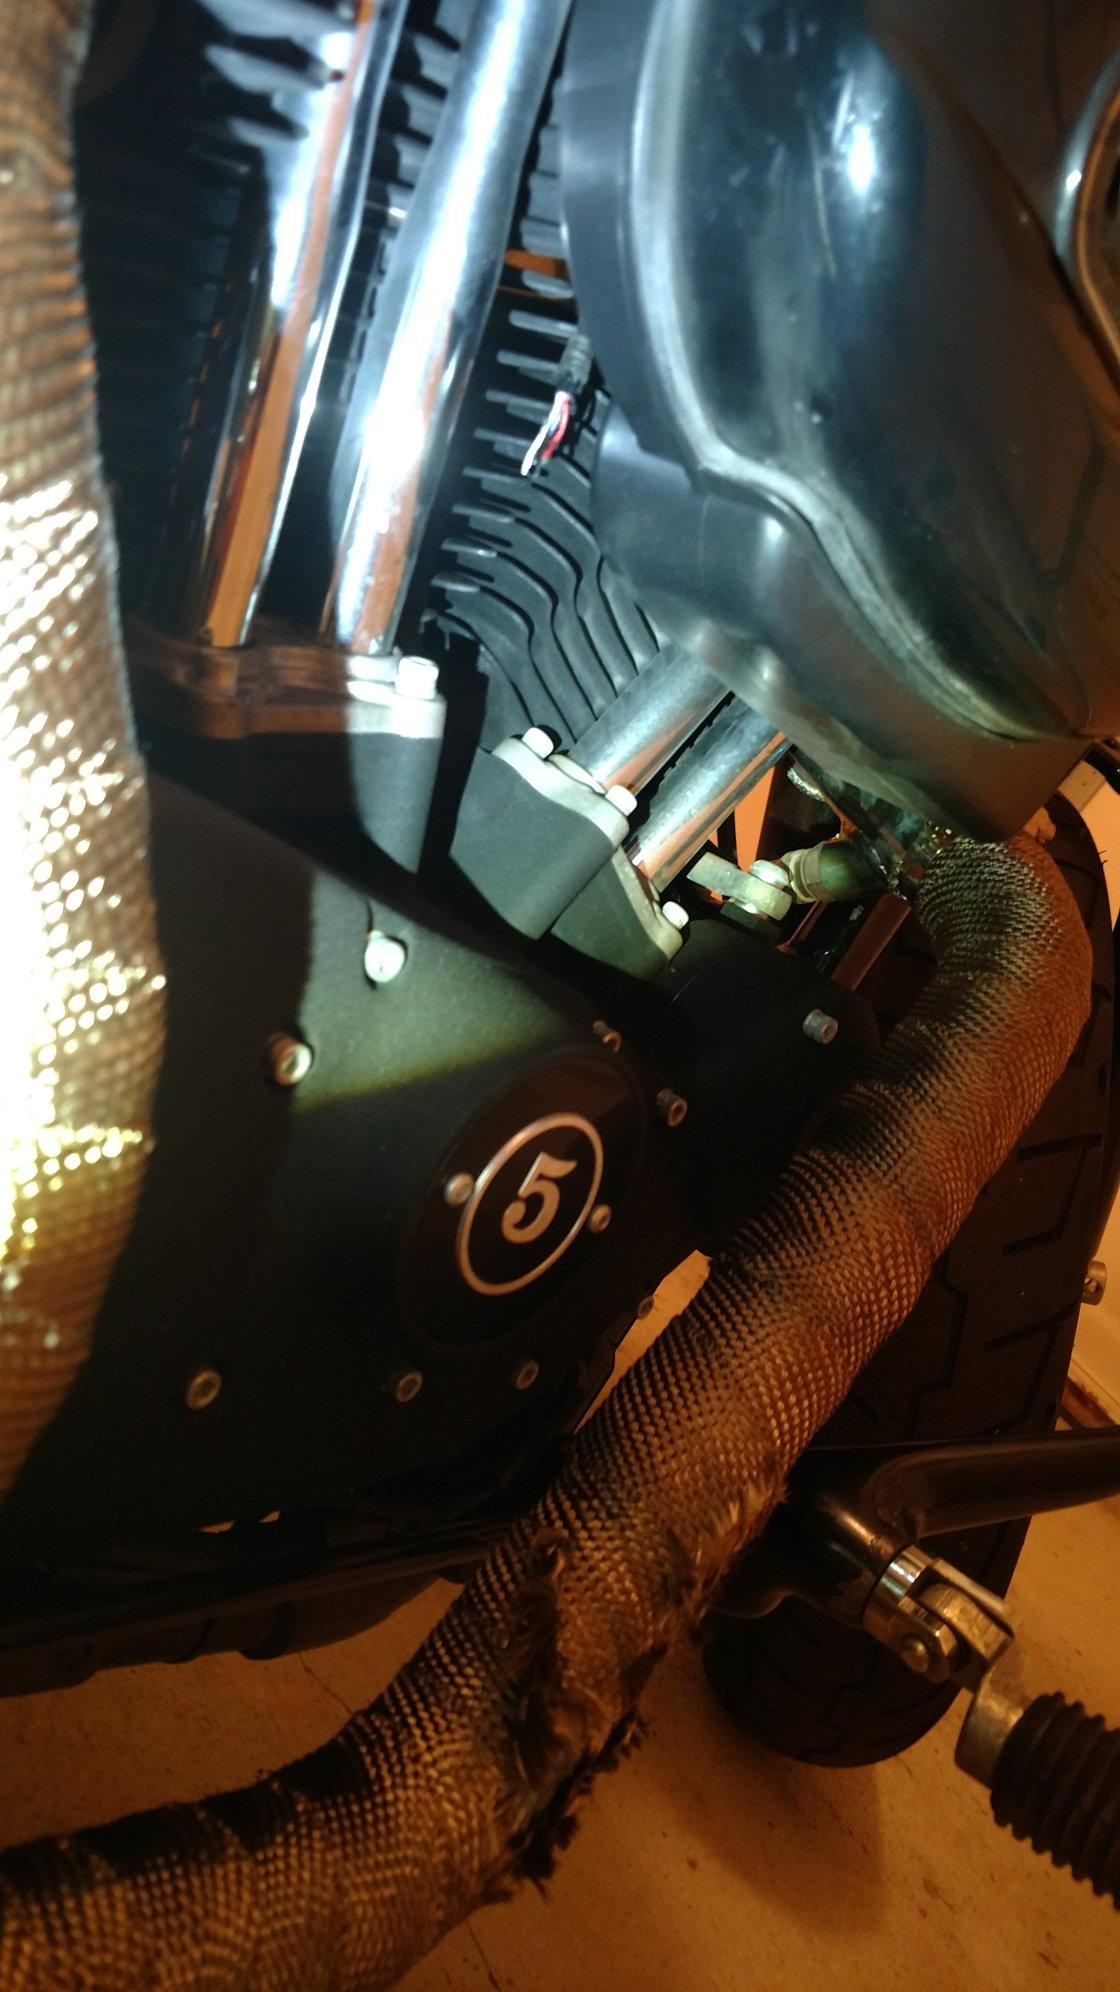 sportster 48 accessory fuse issues harley davidson forums. Black Bedroom Furniture Sets. Home Design Ideas